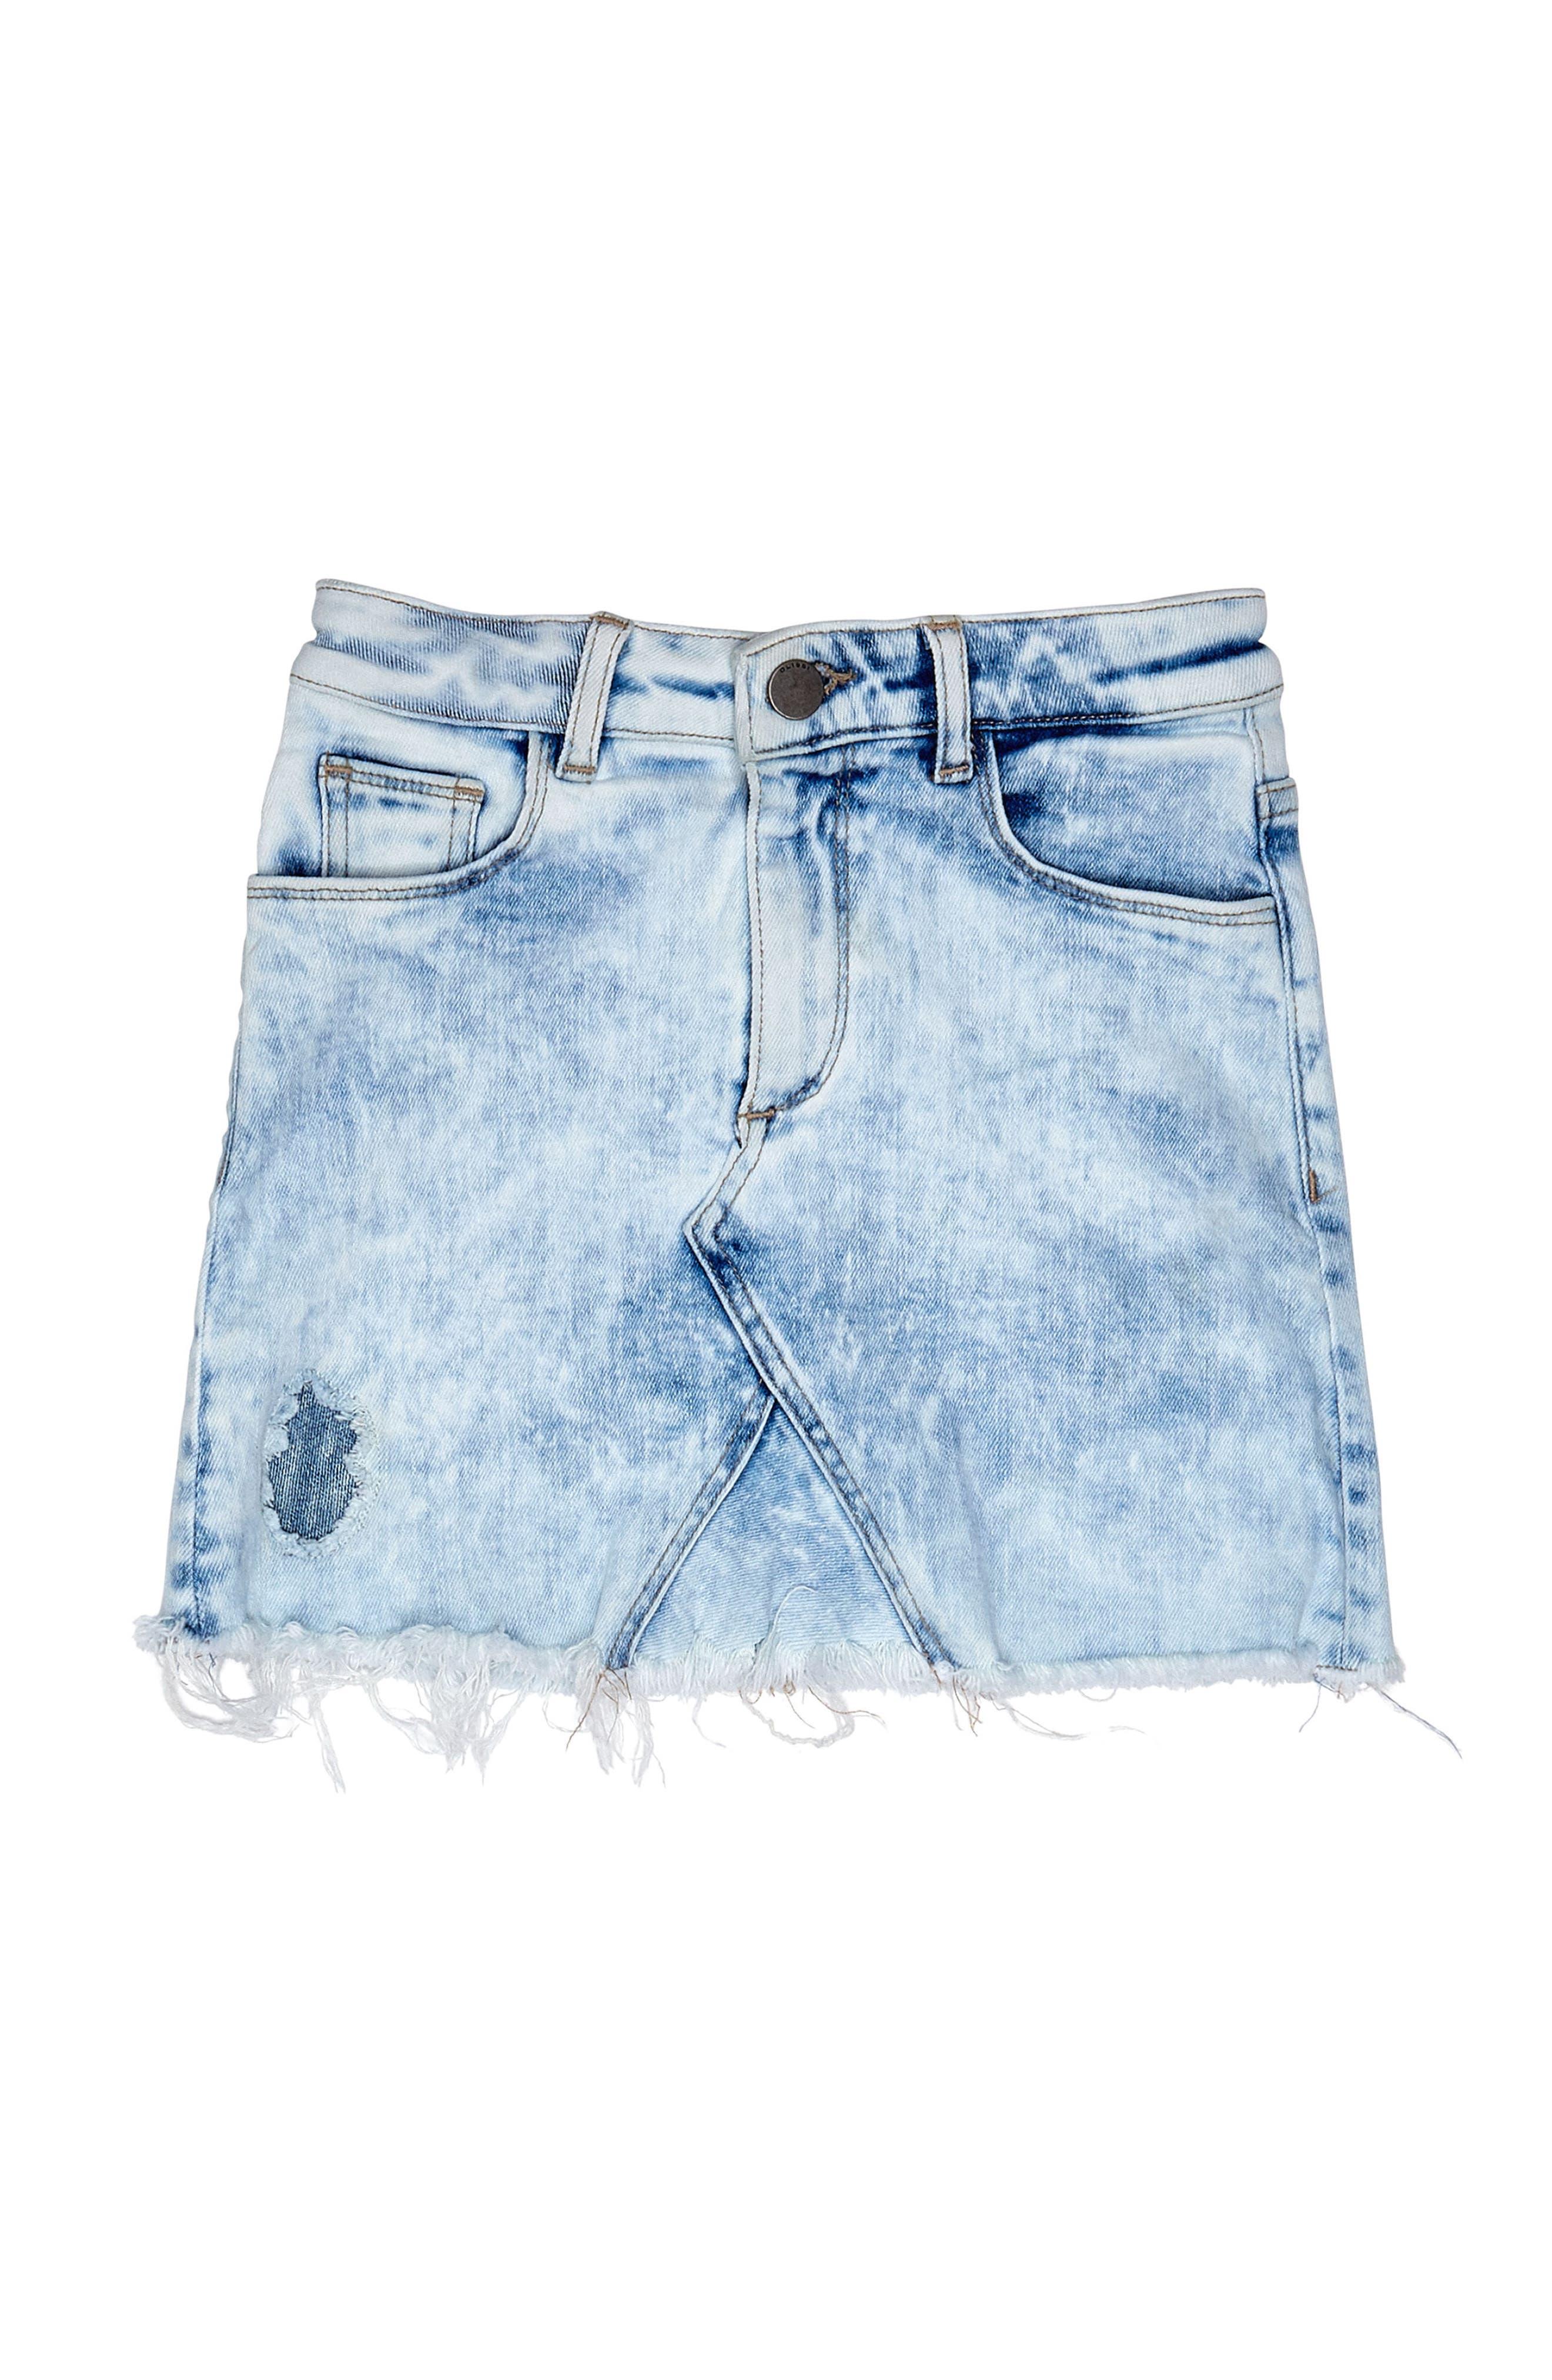 Cutoff Denim Skirt,                         Main,                         color, 430